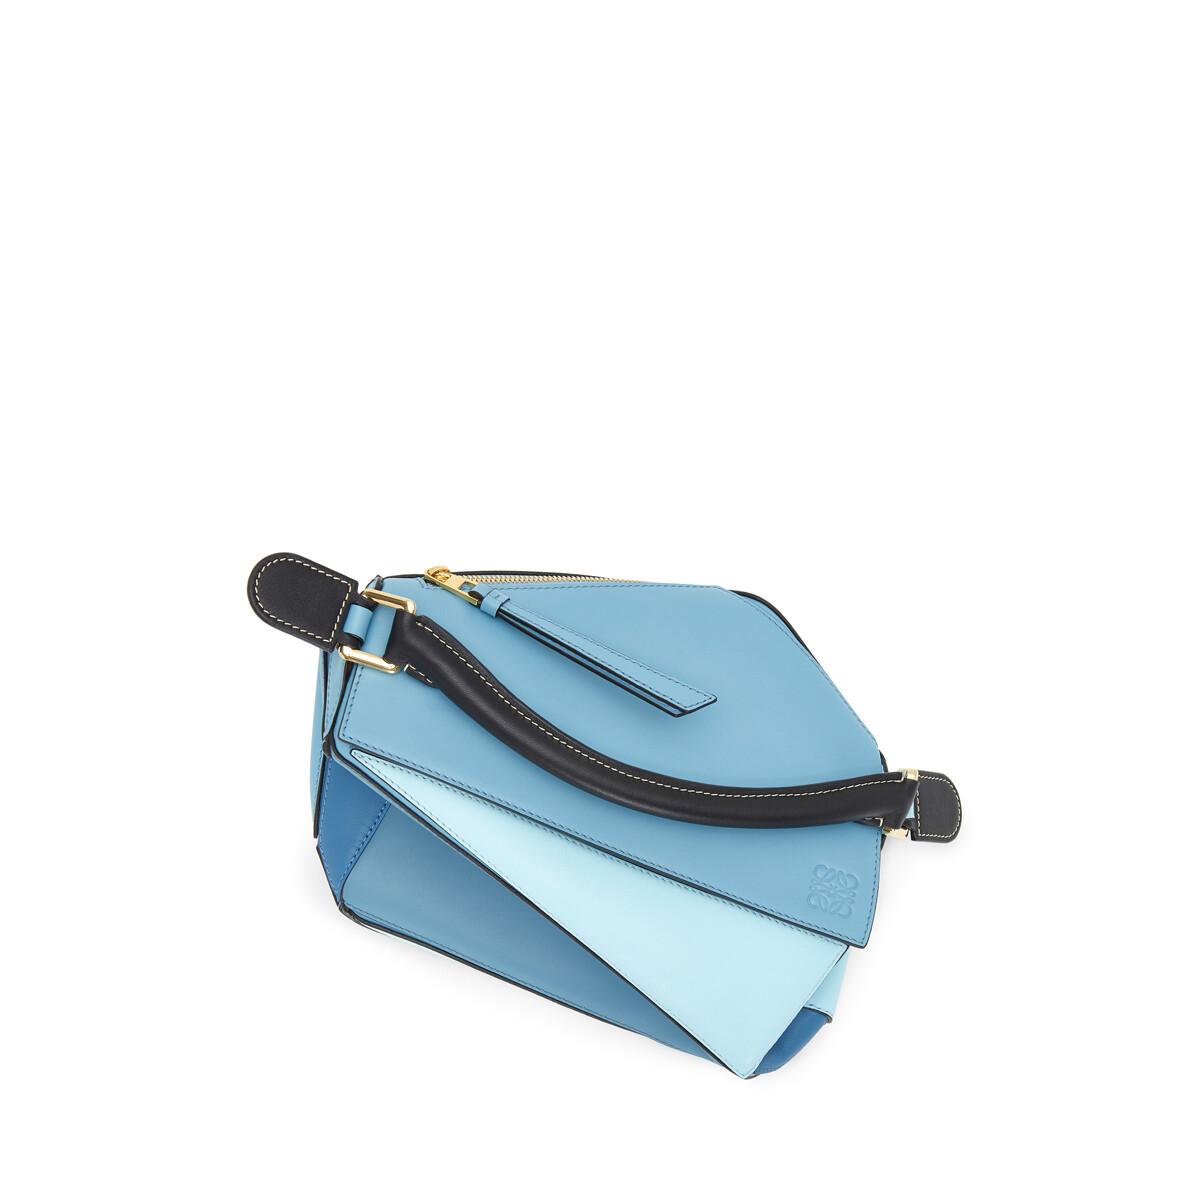 LOEWE Puzzle Small Bag Light Blue/Aqua front